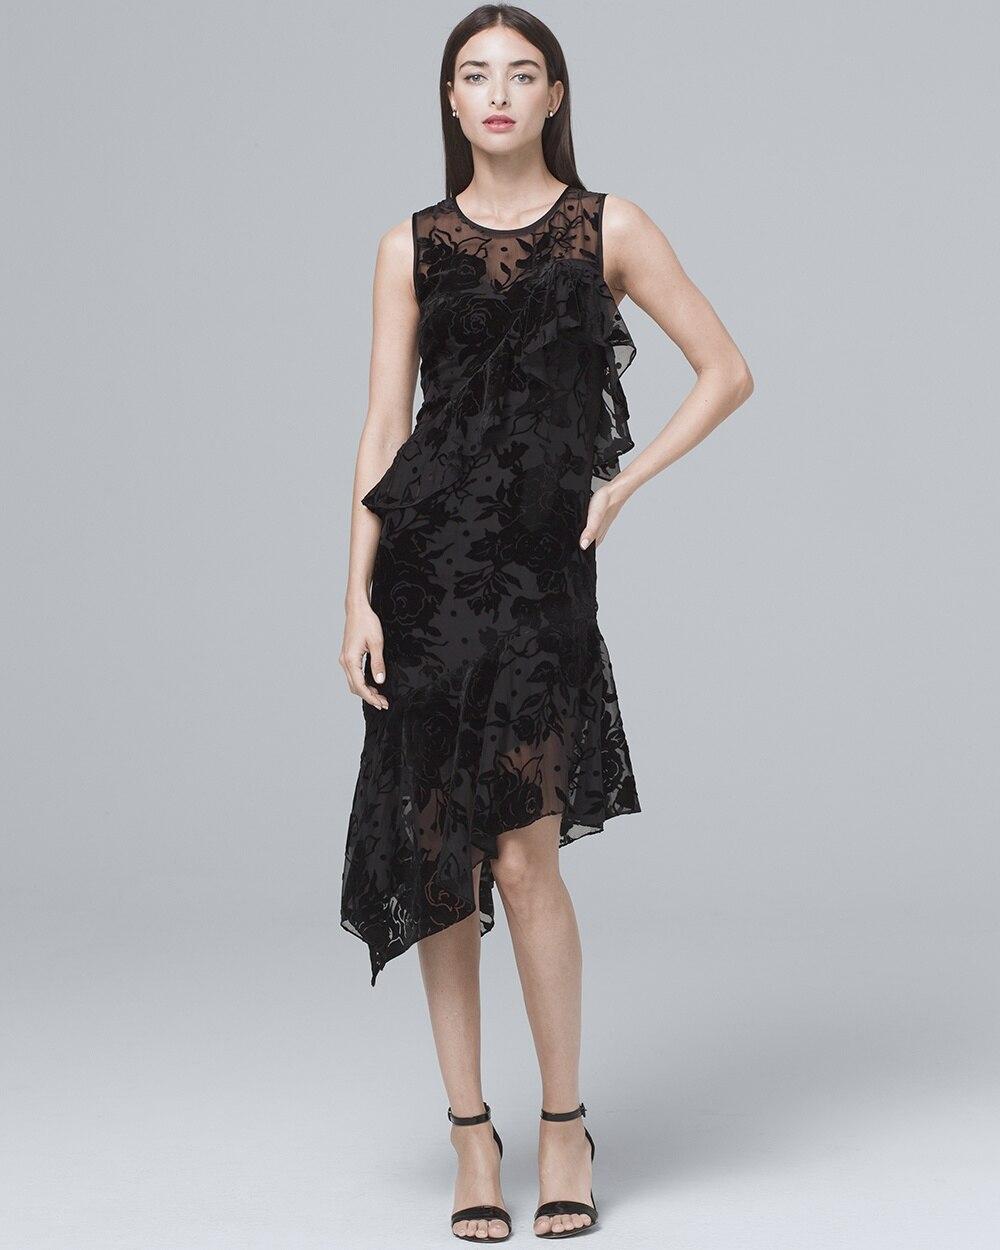 9335e2a292289 Velvet Burnout Black Midi Dress - White House Black Market